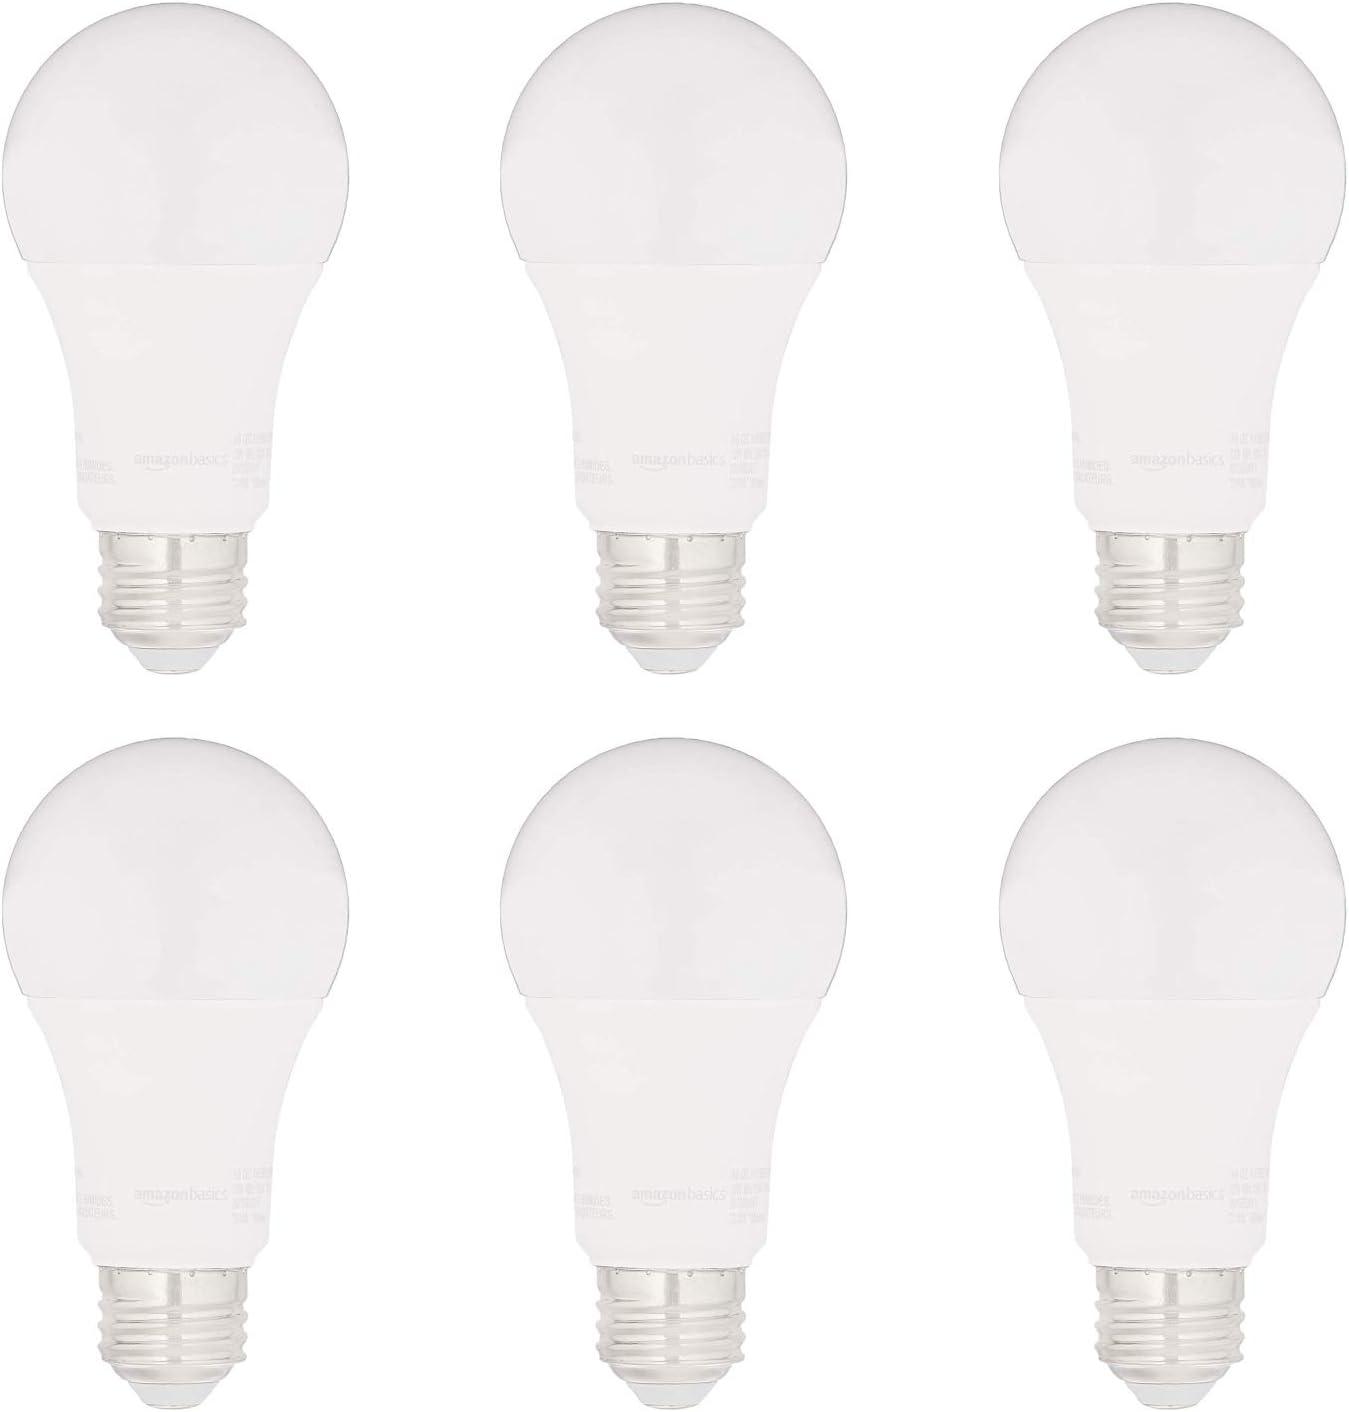 AmazonBasics 75W Equivalent, Soft White, Non-Dimmable, 15,000 Hour Lifetime, CEC Compliant, A19 LED Light Bulbs | 6-Pack